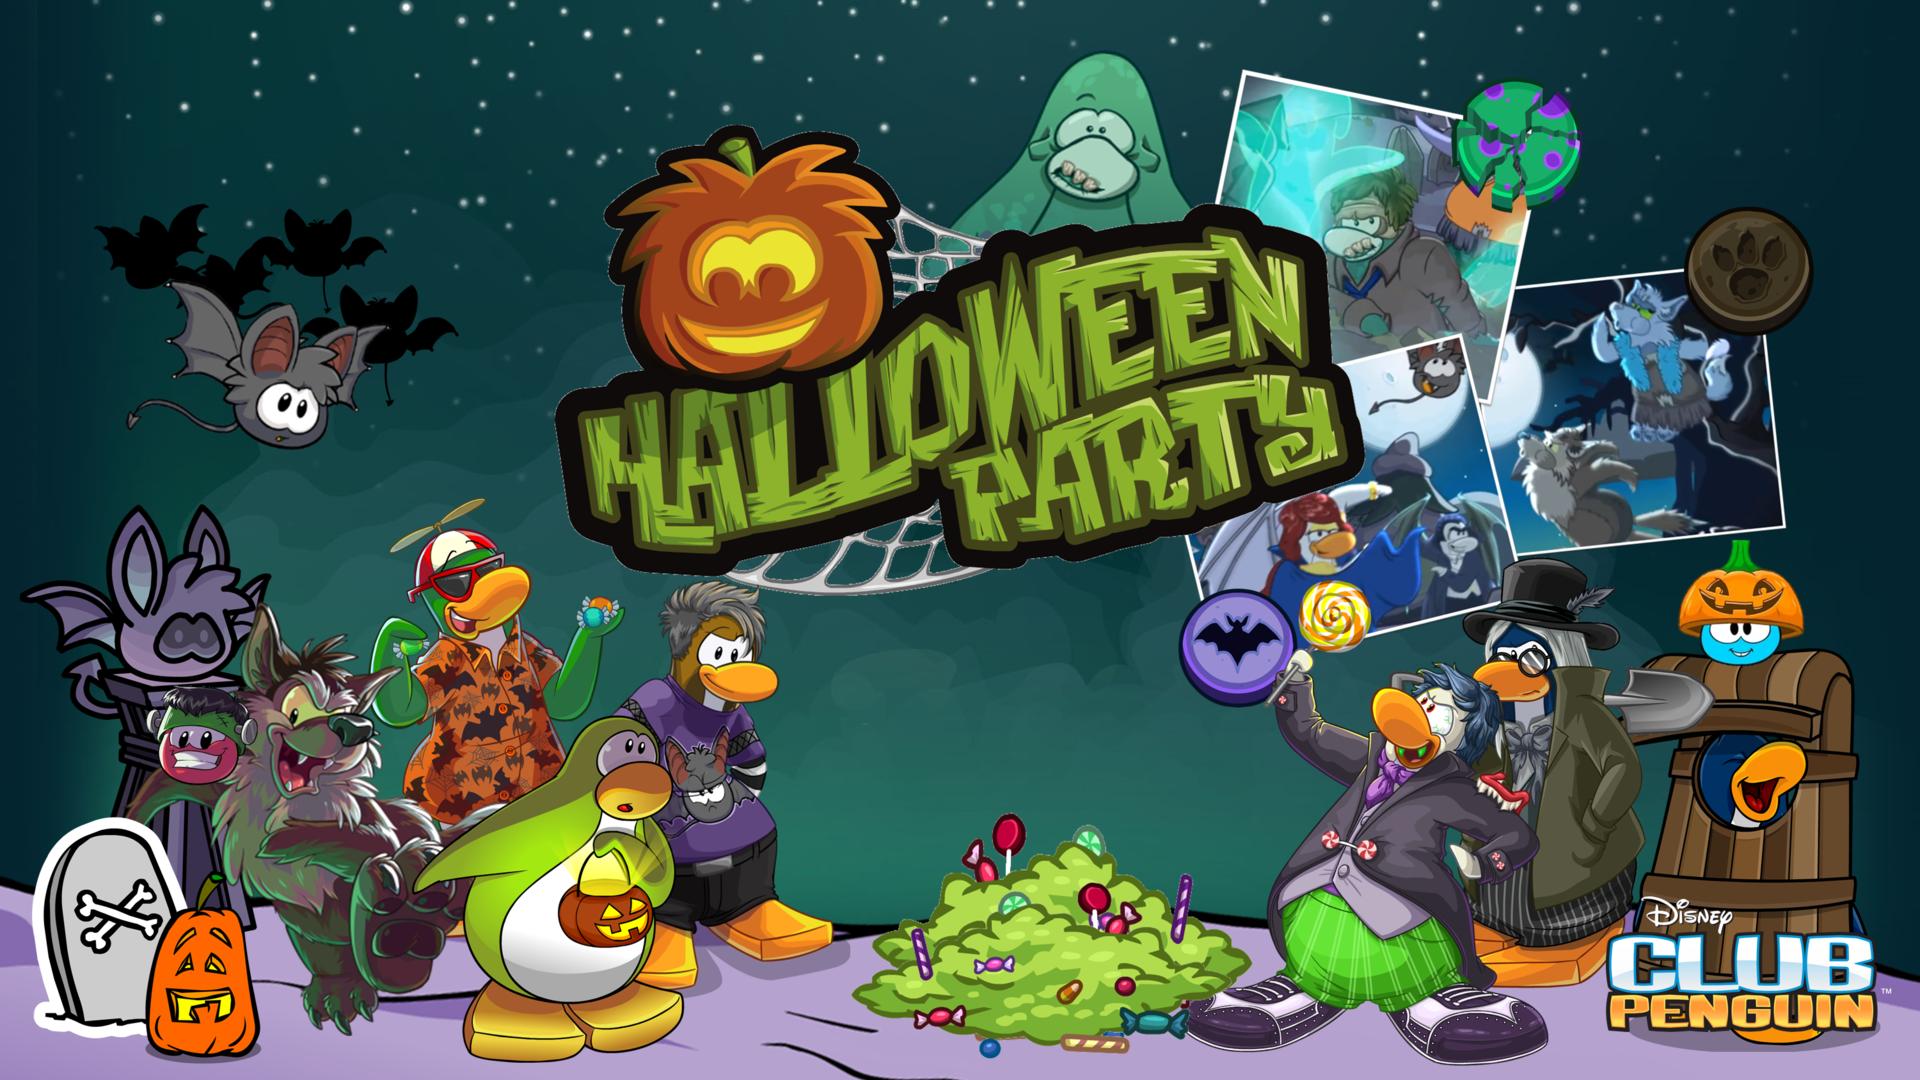 halloween party 2013 halloween2013 wallpaper madeby khantar07 update - Halloween Party Wallpaper